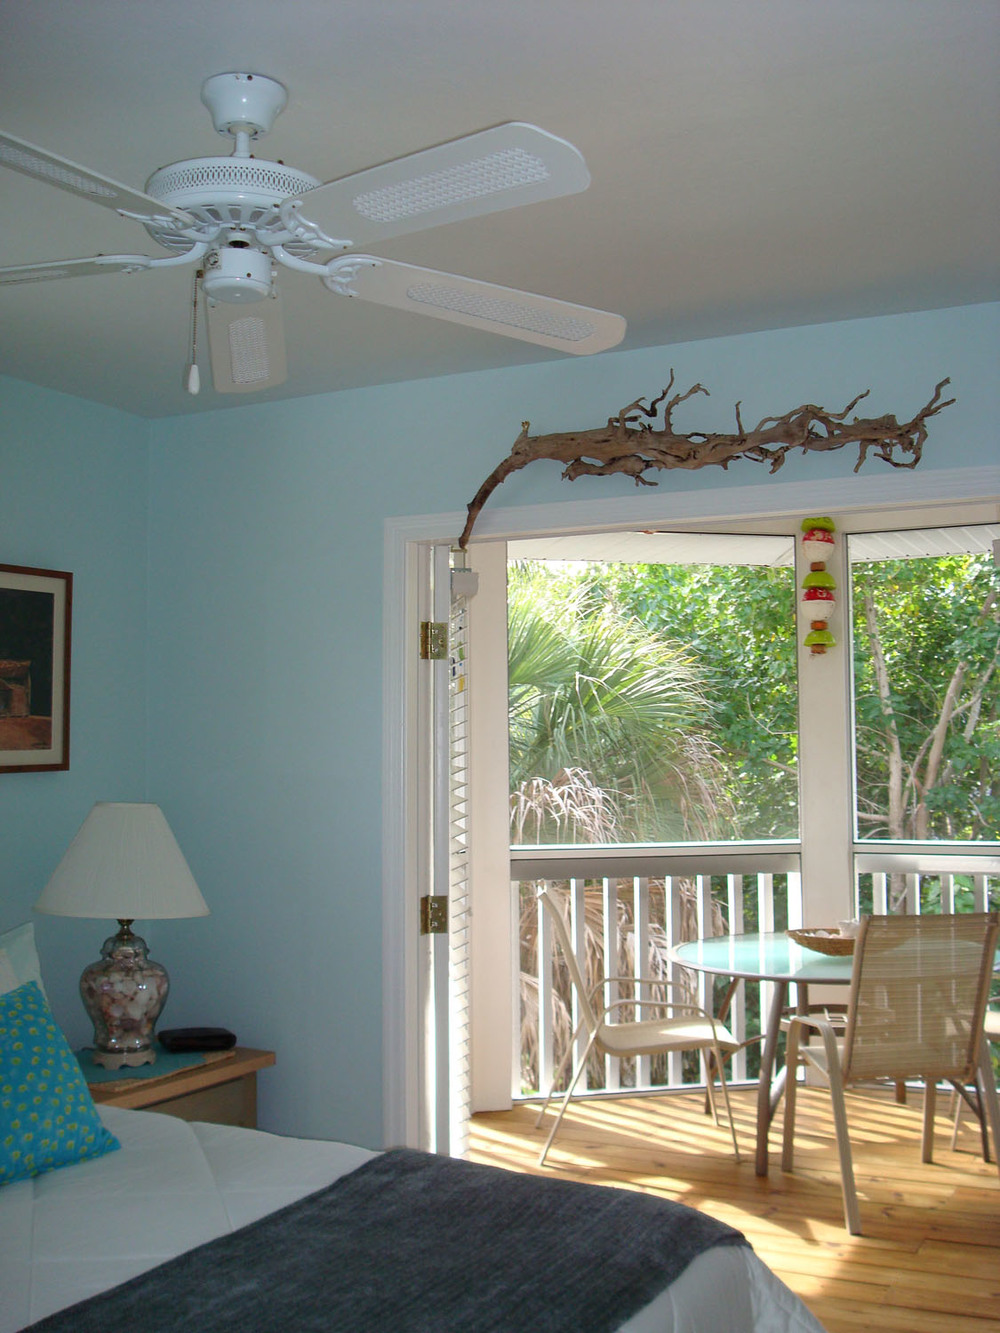 island-beach-house-renovation-bedroom-deck-with-table-doorway-13.jpg